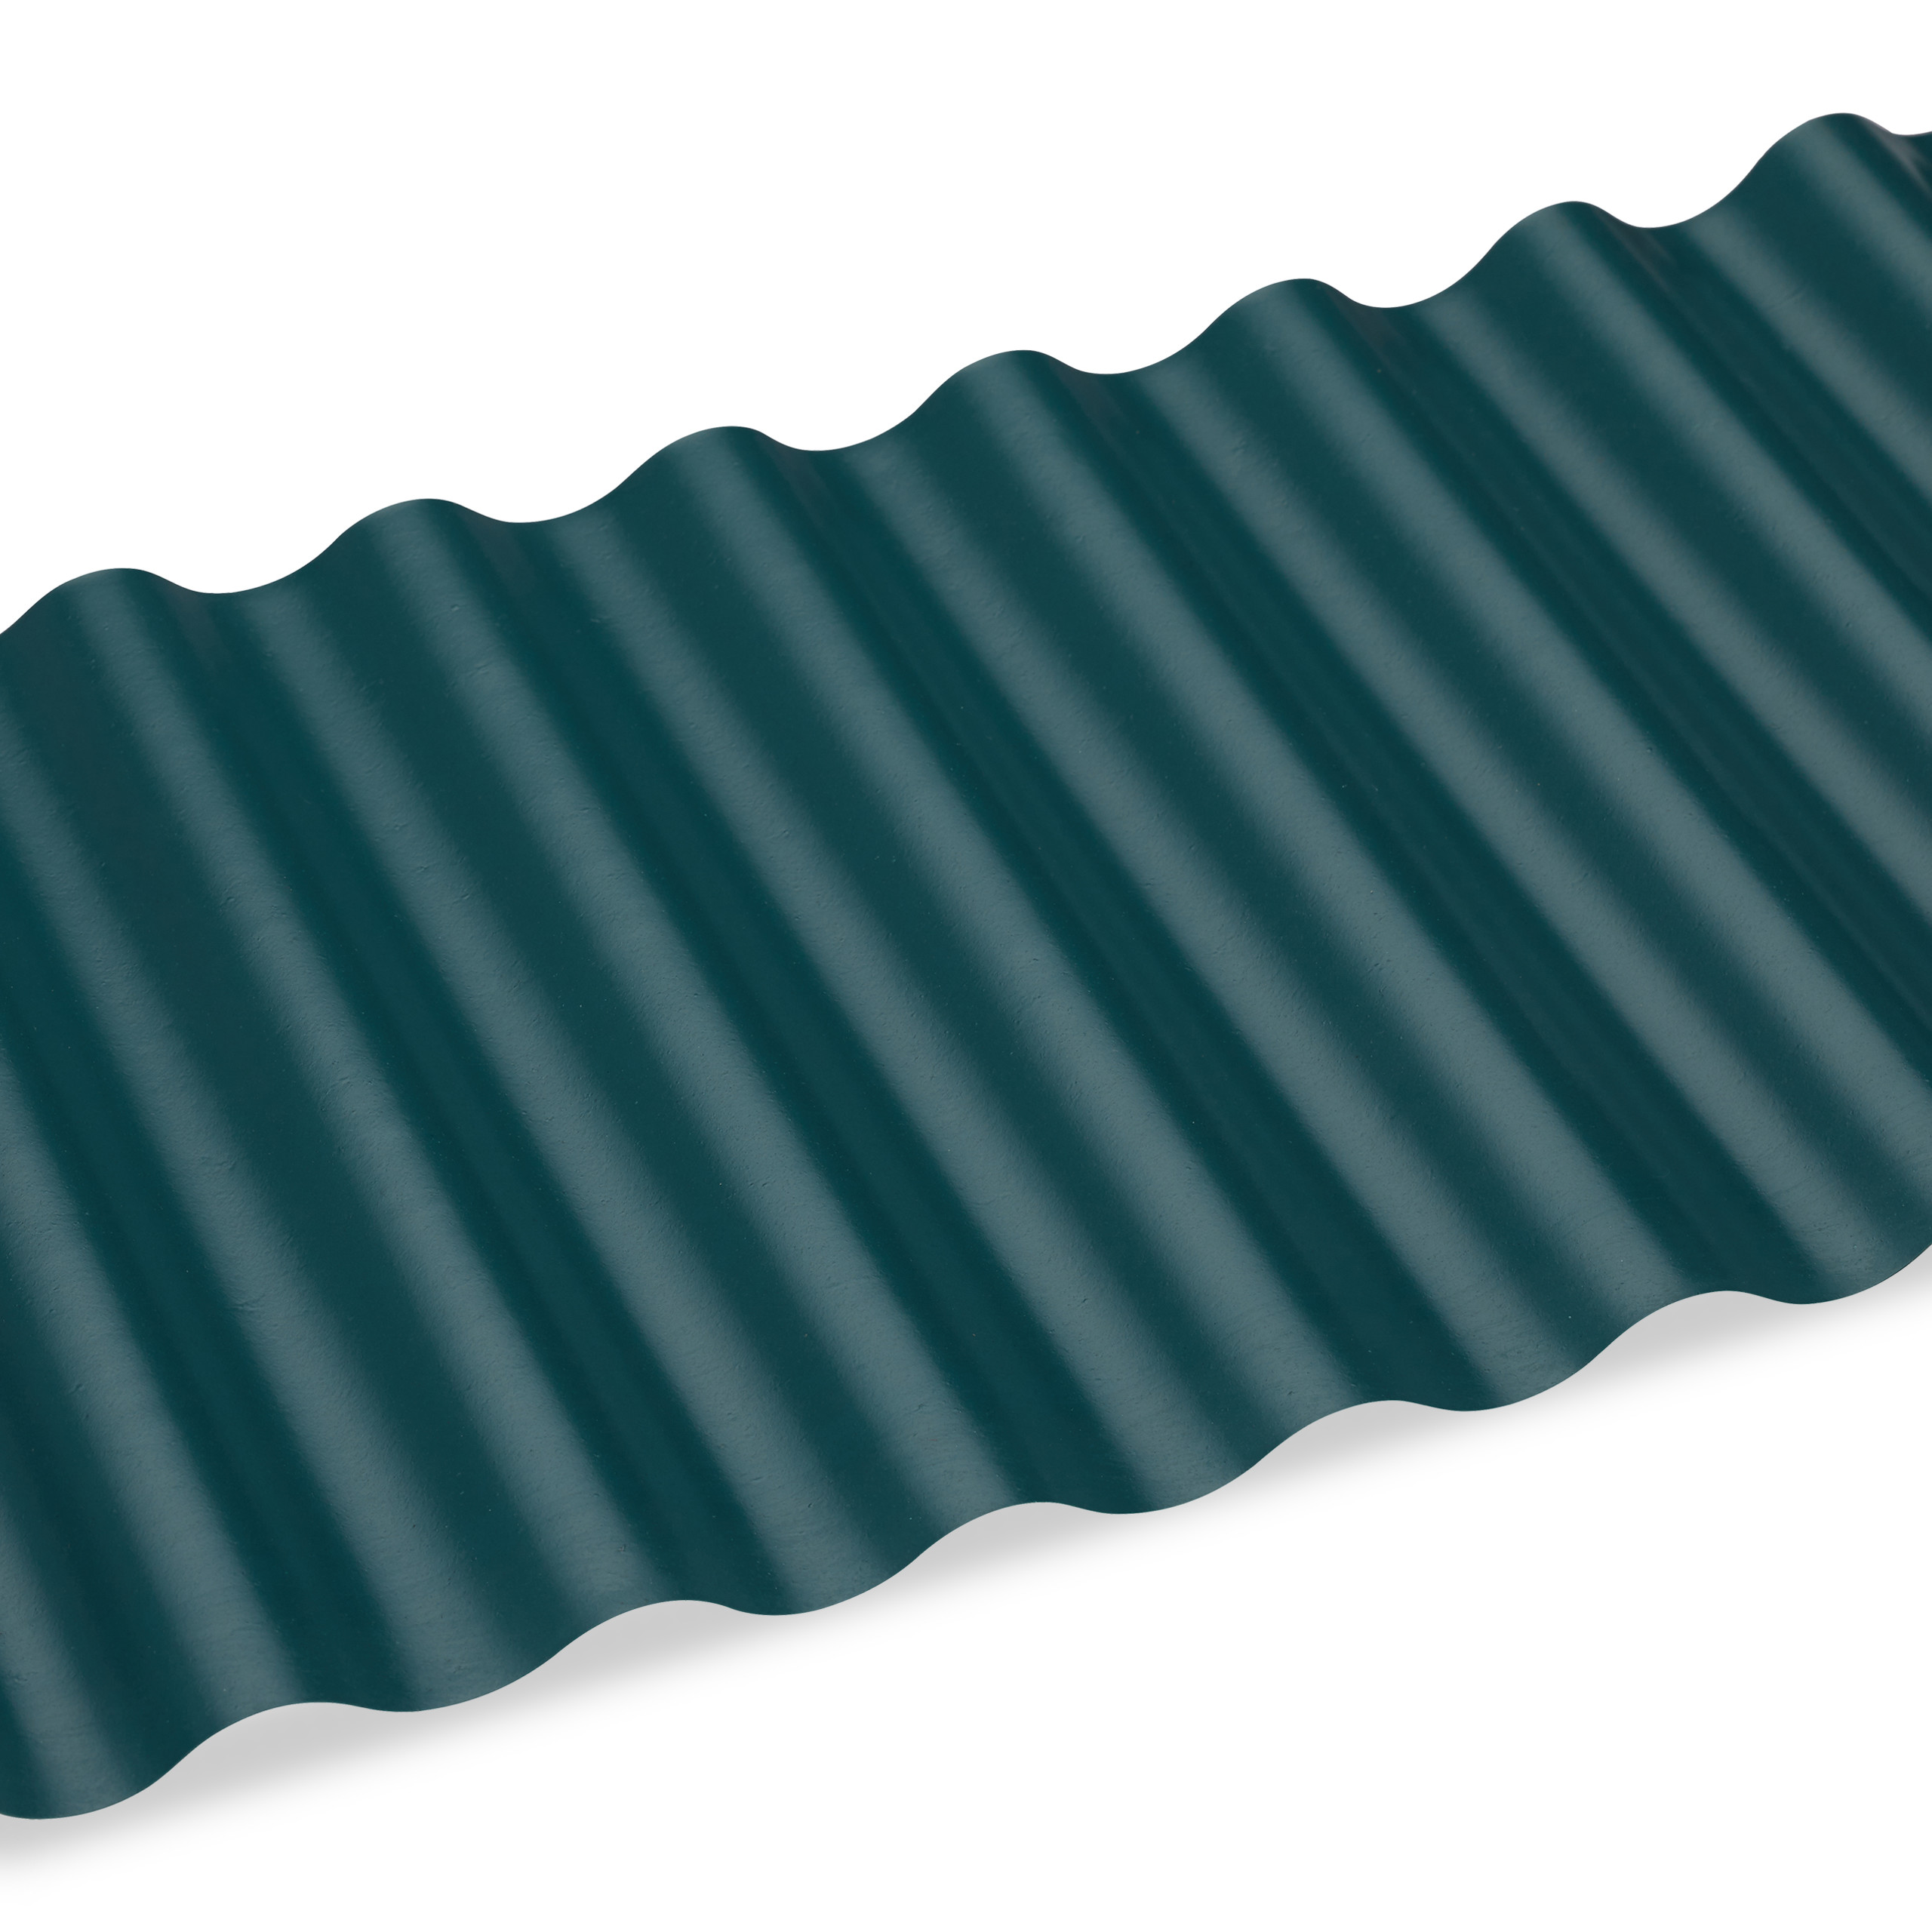 Rasenkante Beet flexibel Rasenumrandung 9m Kunststoff 20cm hoch Beetbegrenzung